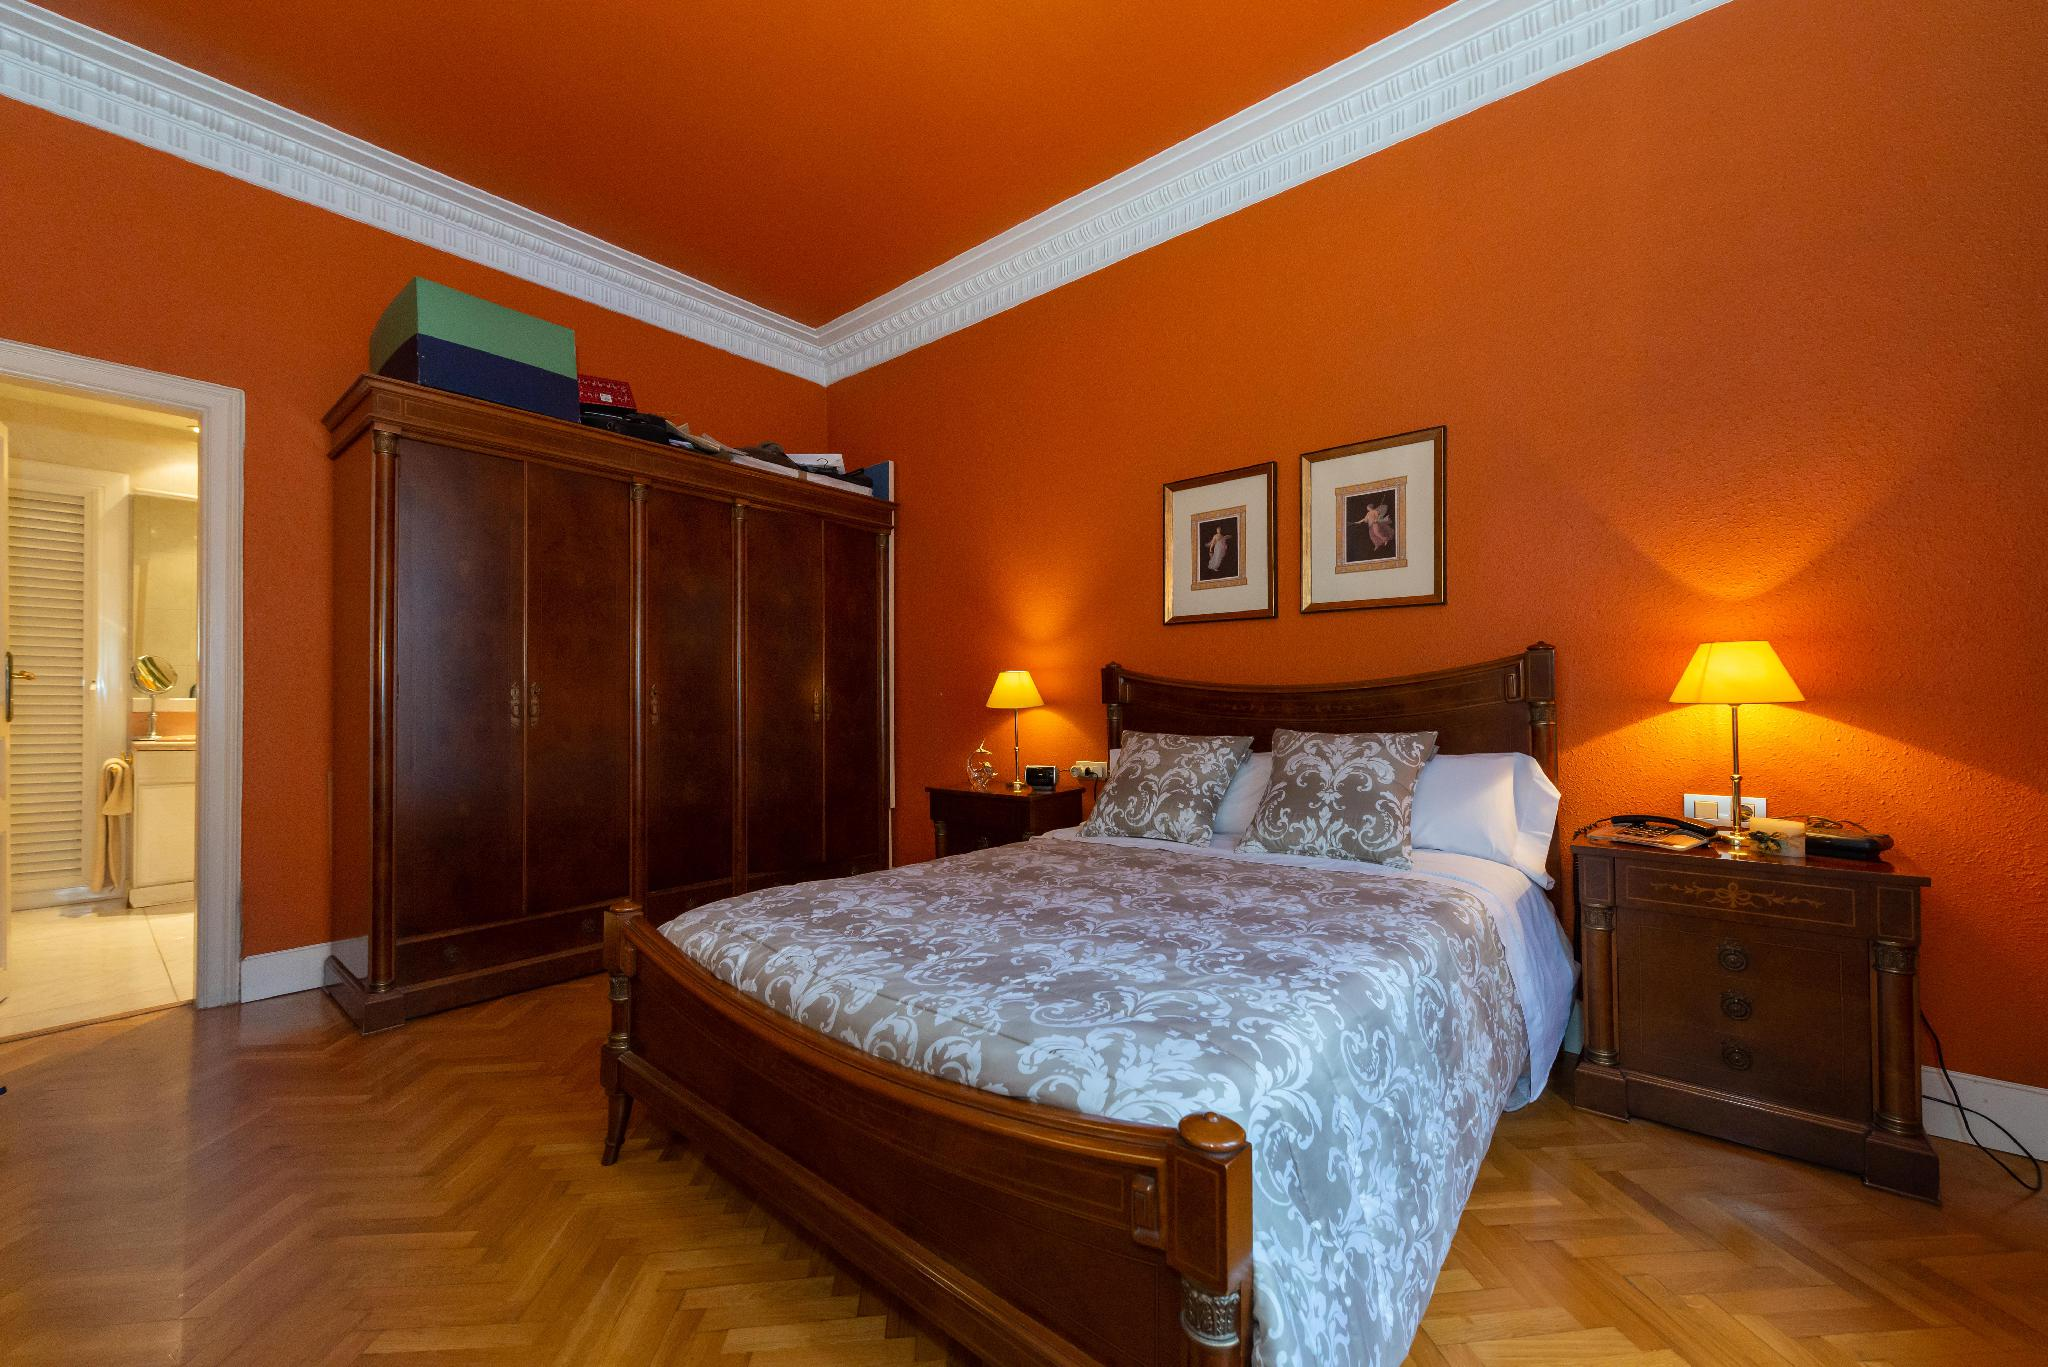 166582 Flat for sale in Eixample, Dreta Eixample 23